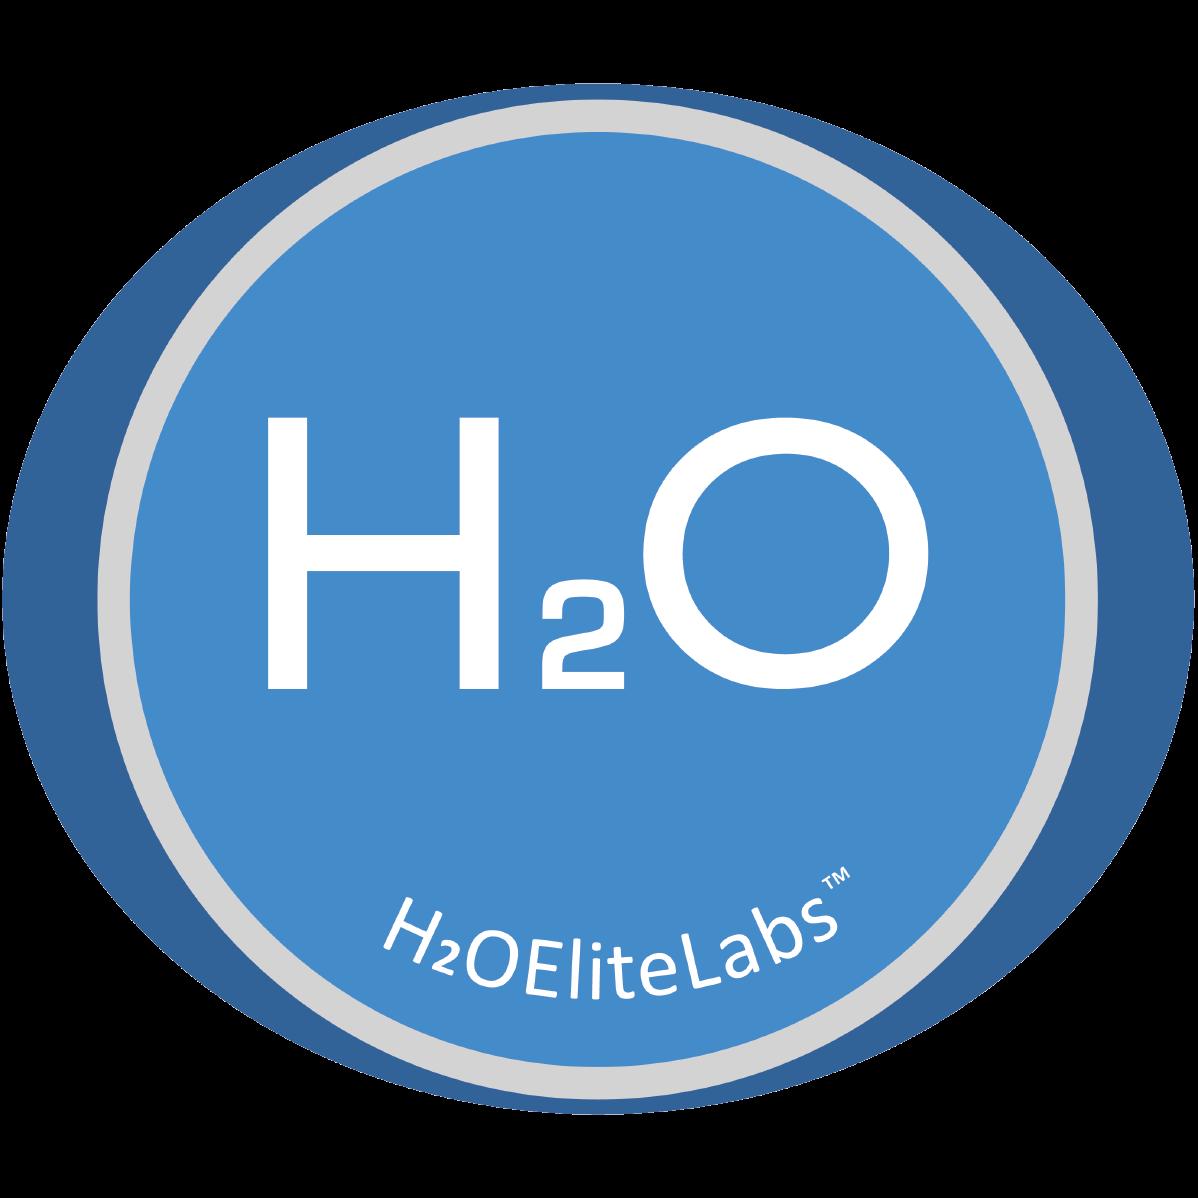 H2OEliteLabs Chile